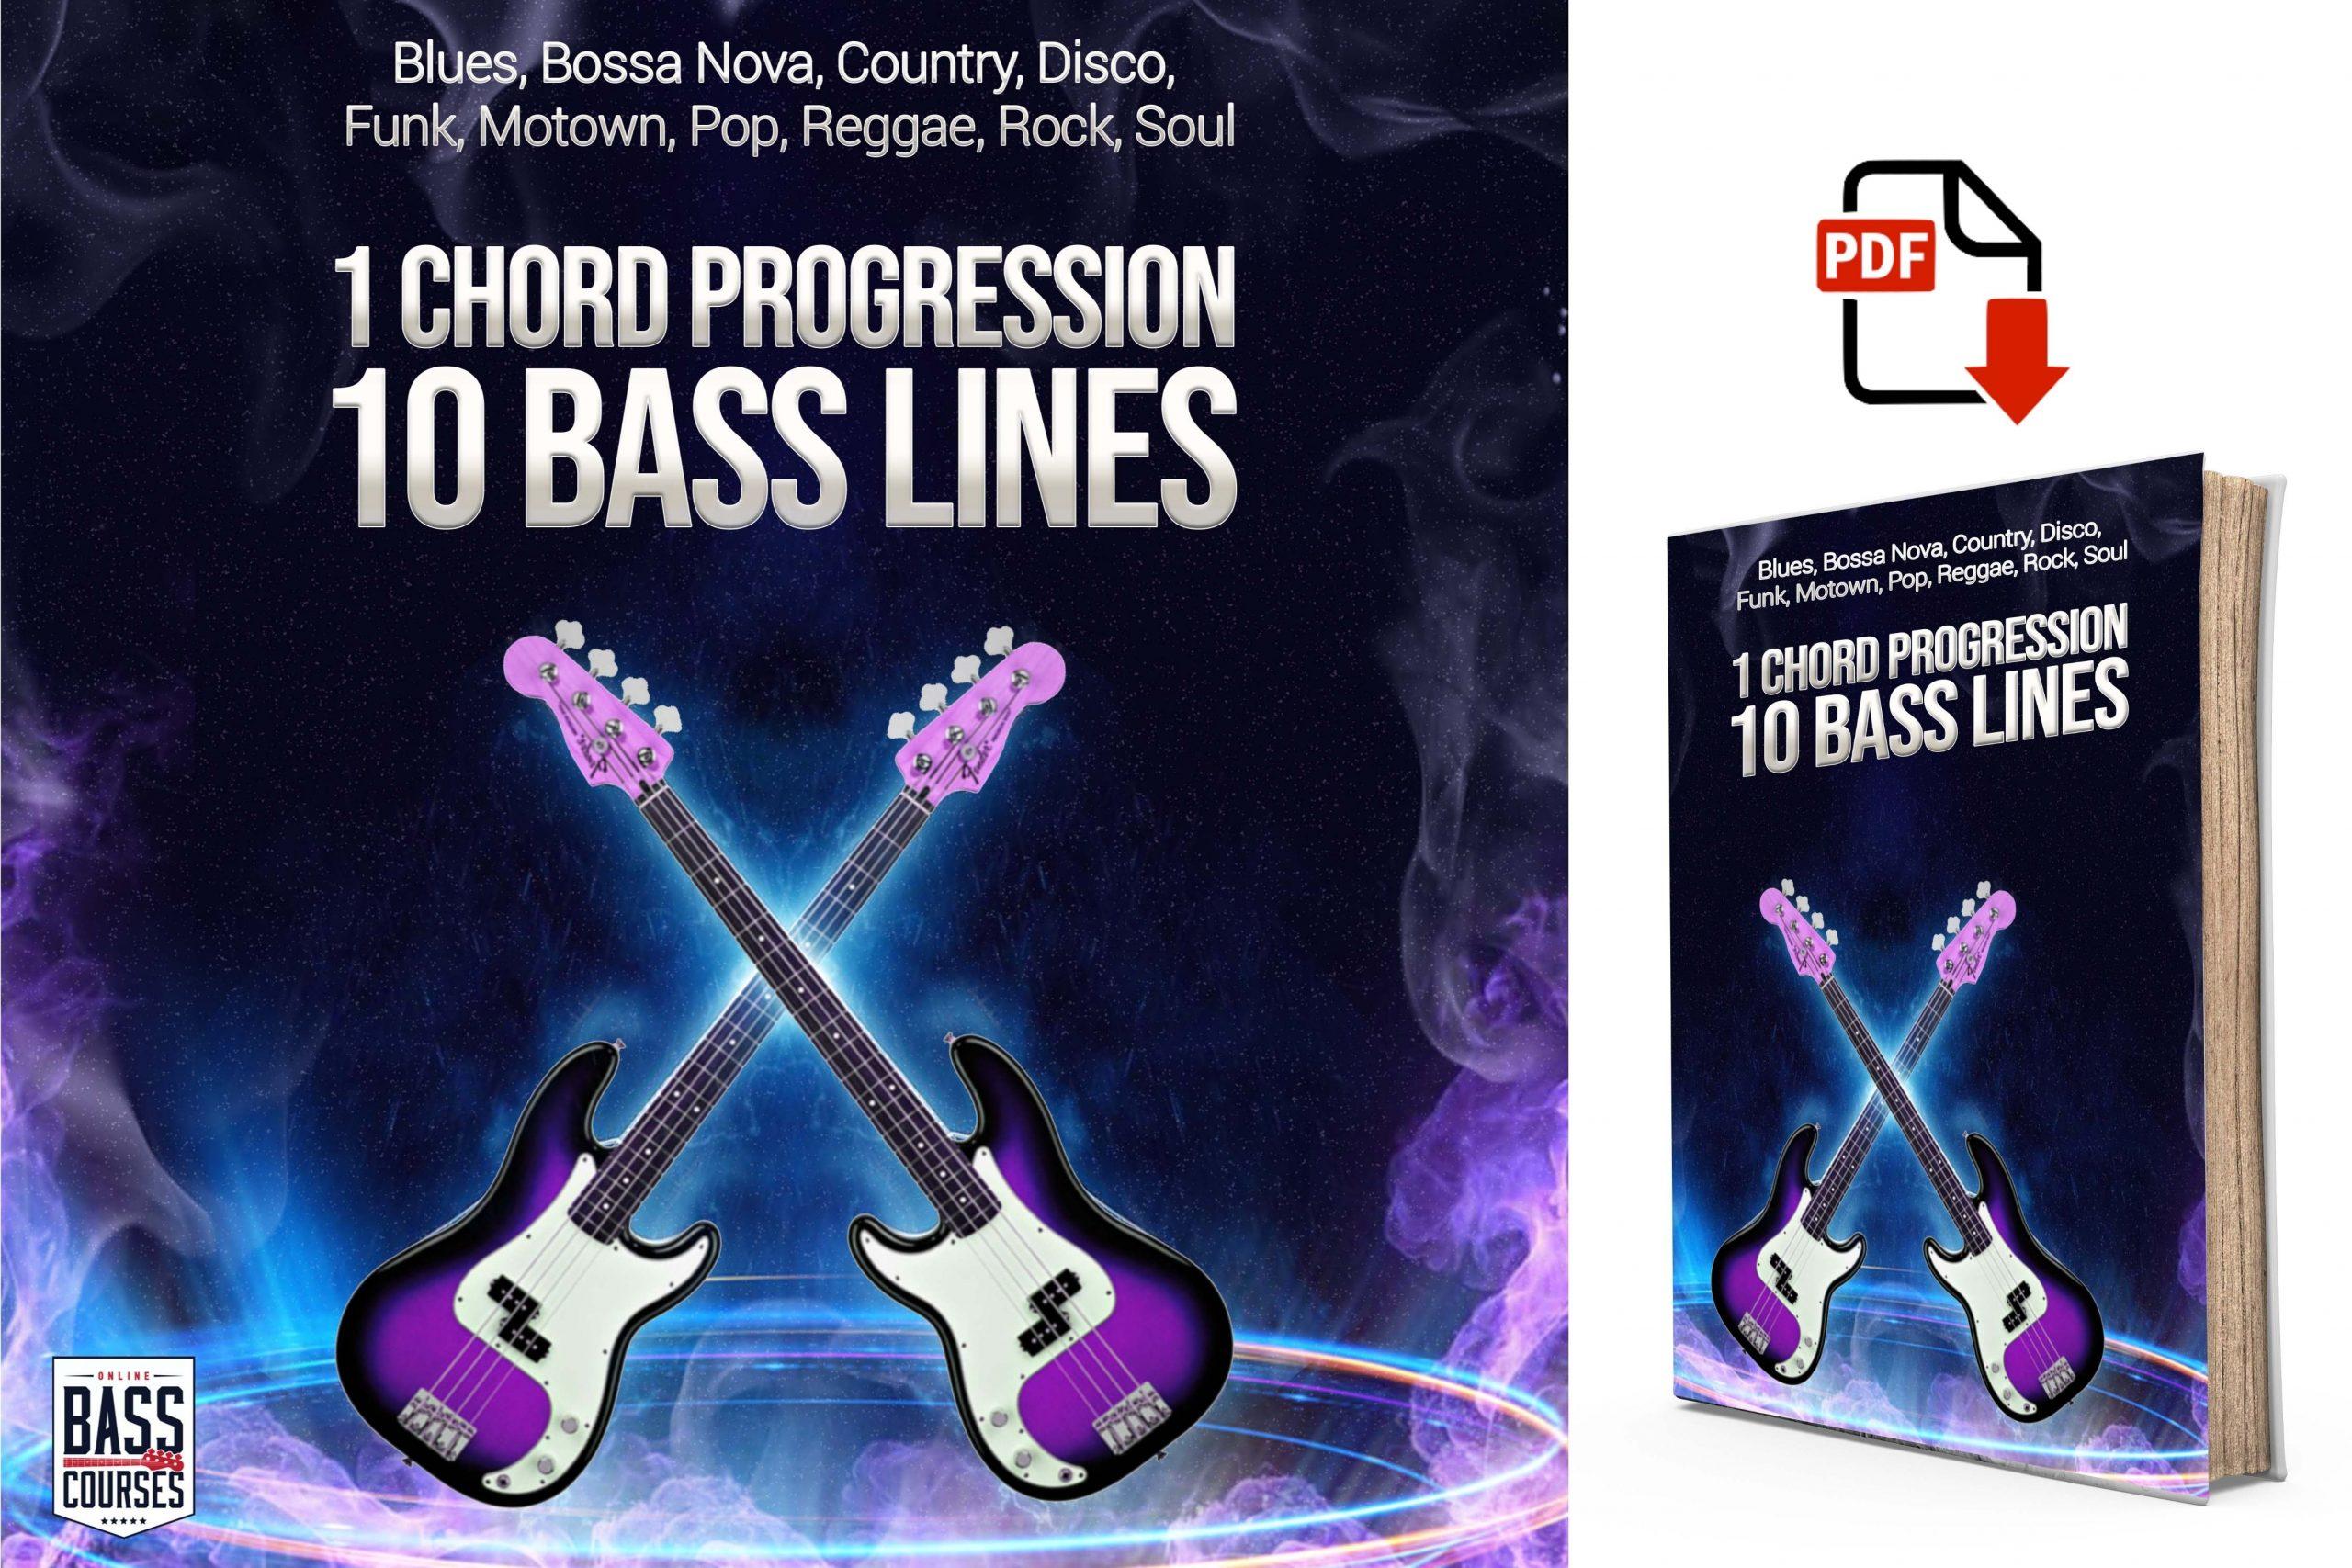 1 Chord Progression 10 Bass Lines